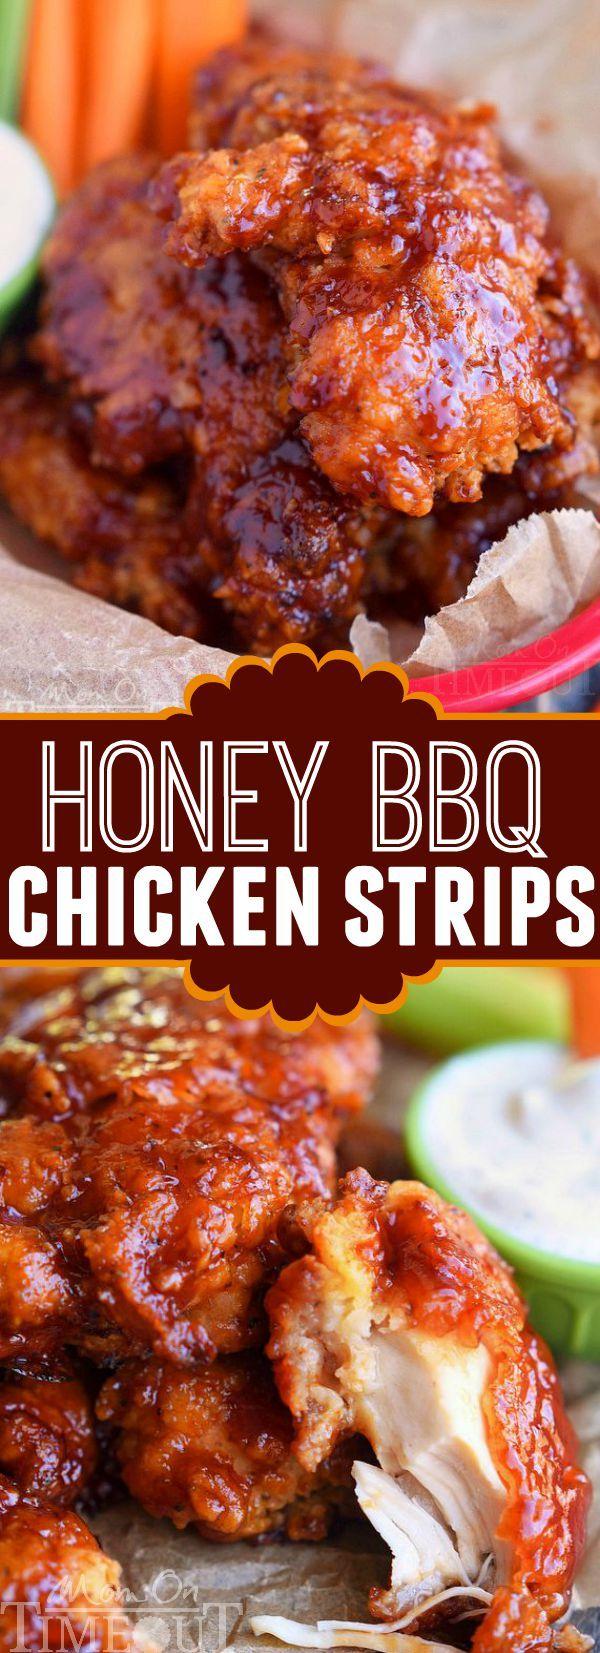 Honey BBQ Chicken Strips on MyRecipeMagic.com